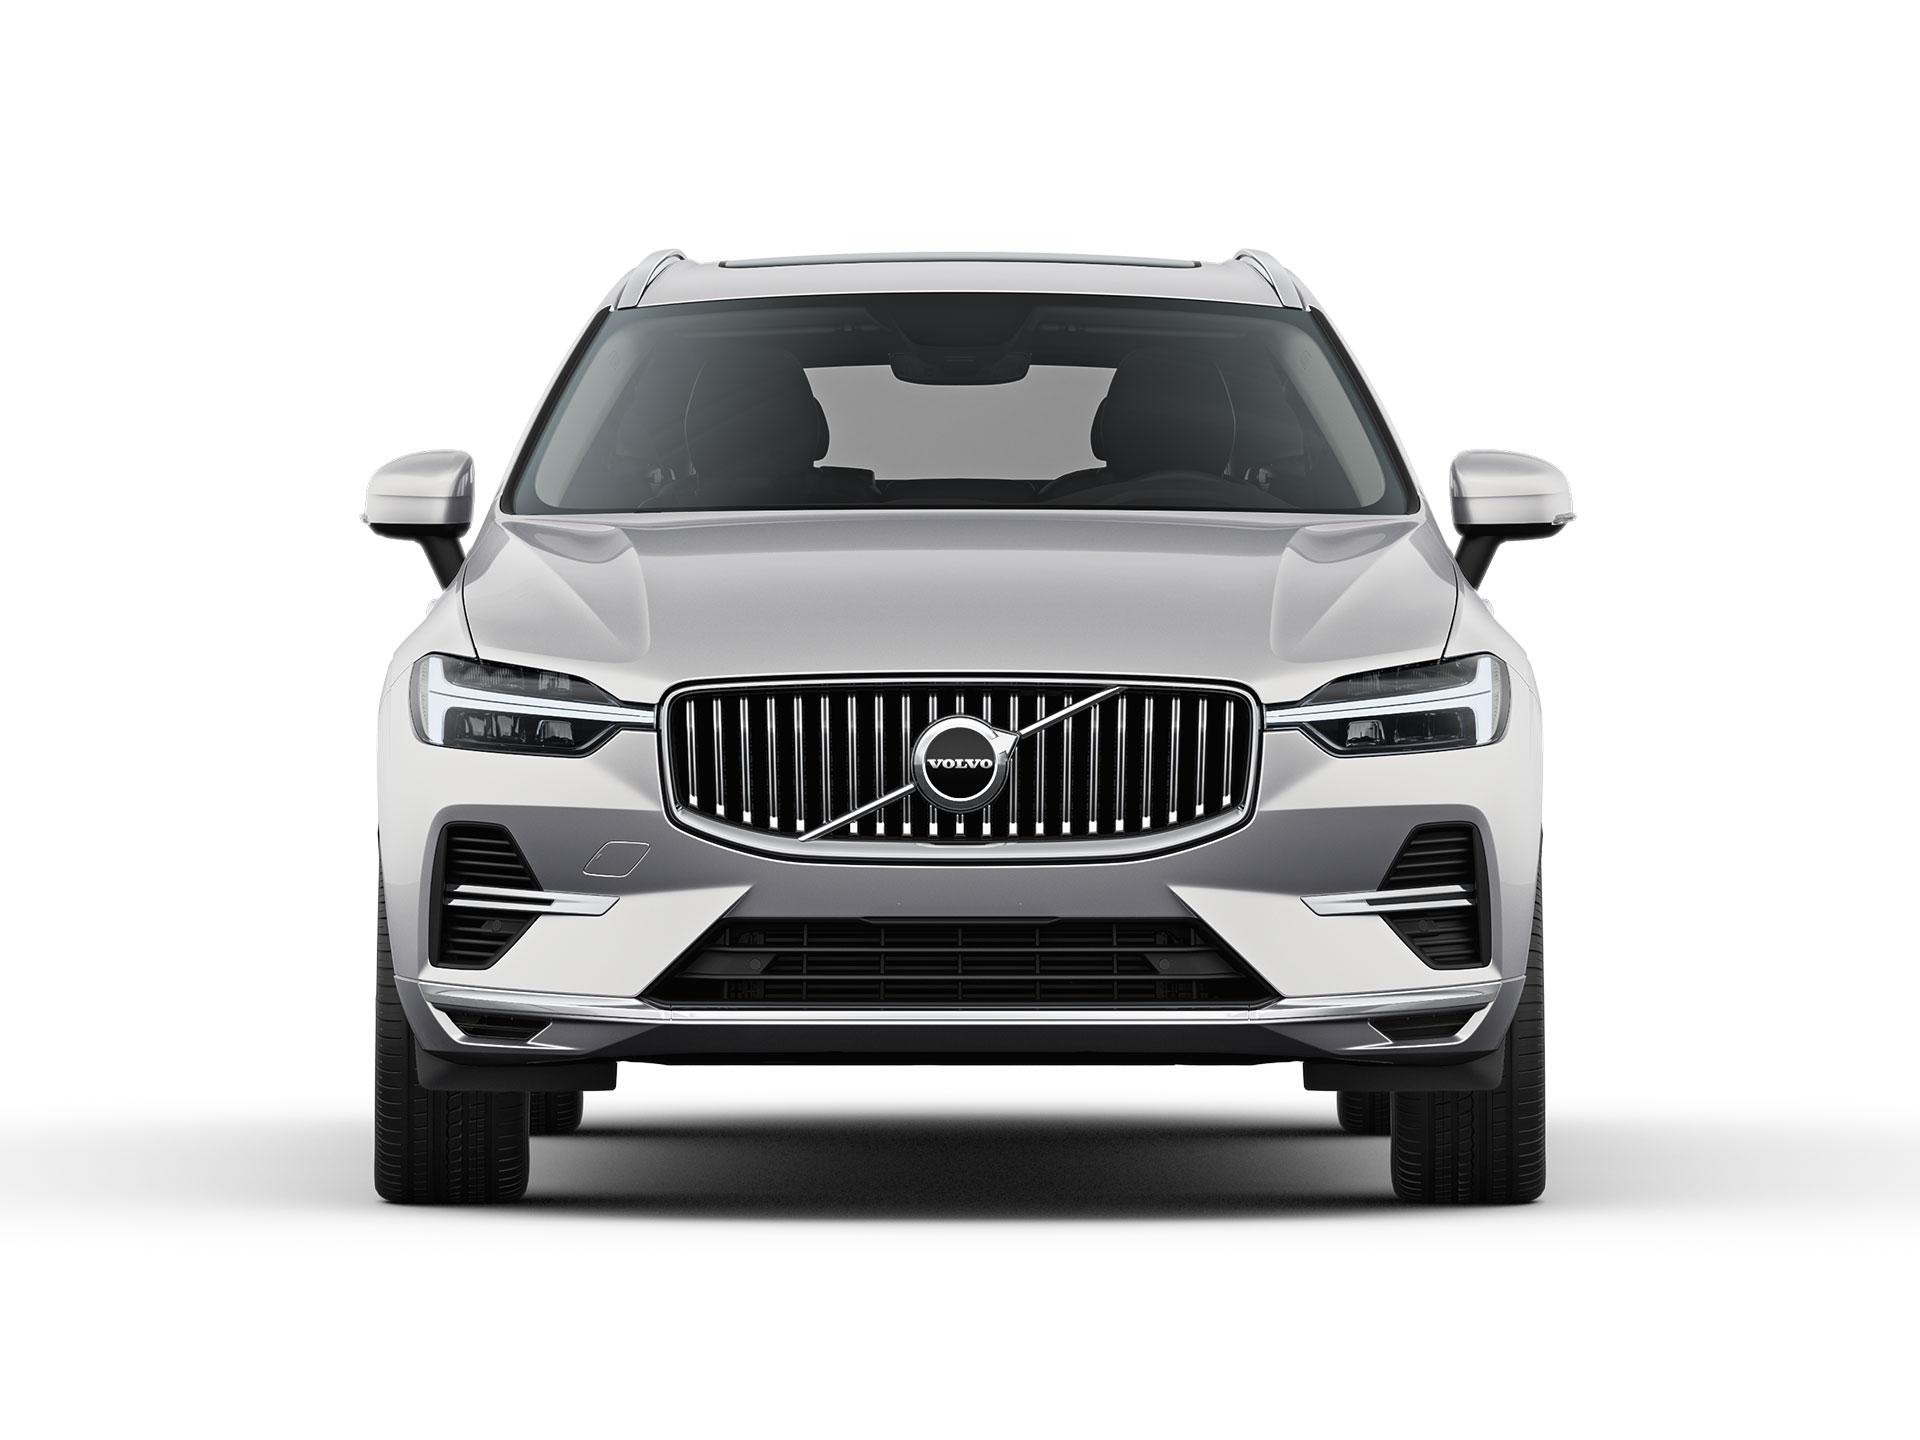 Fremsiden på en Volvo XC60 Recharge ladbar hybrid-SUV